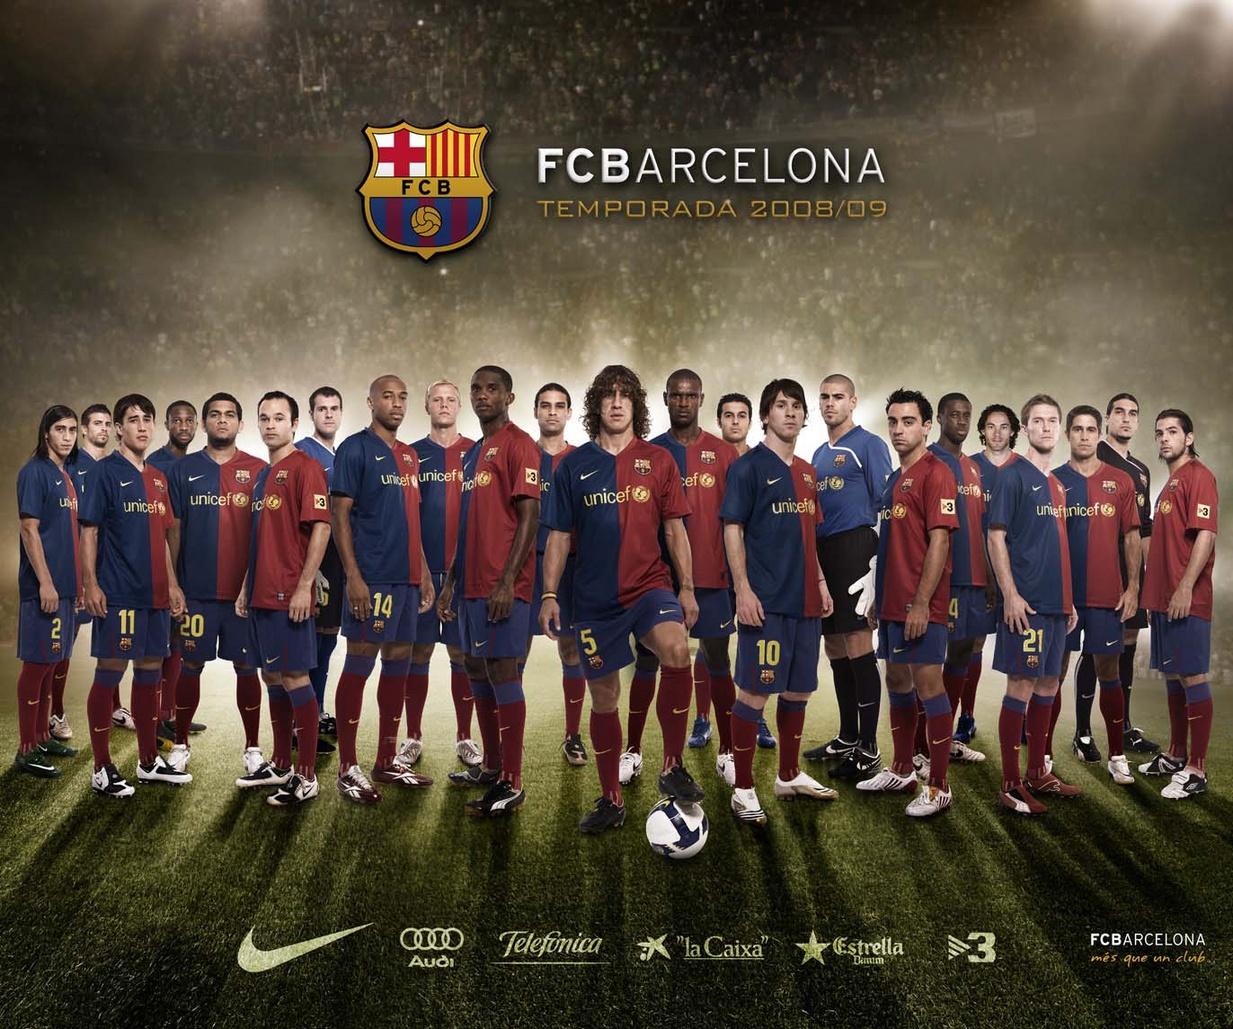 football soccer wallpaper barcelona team squad 01 800x600jpg 1233x1029